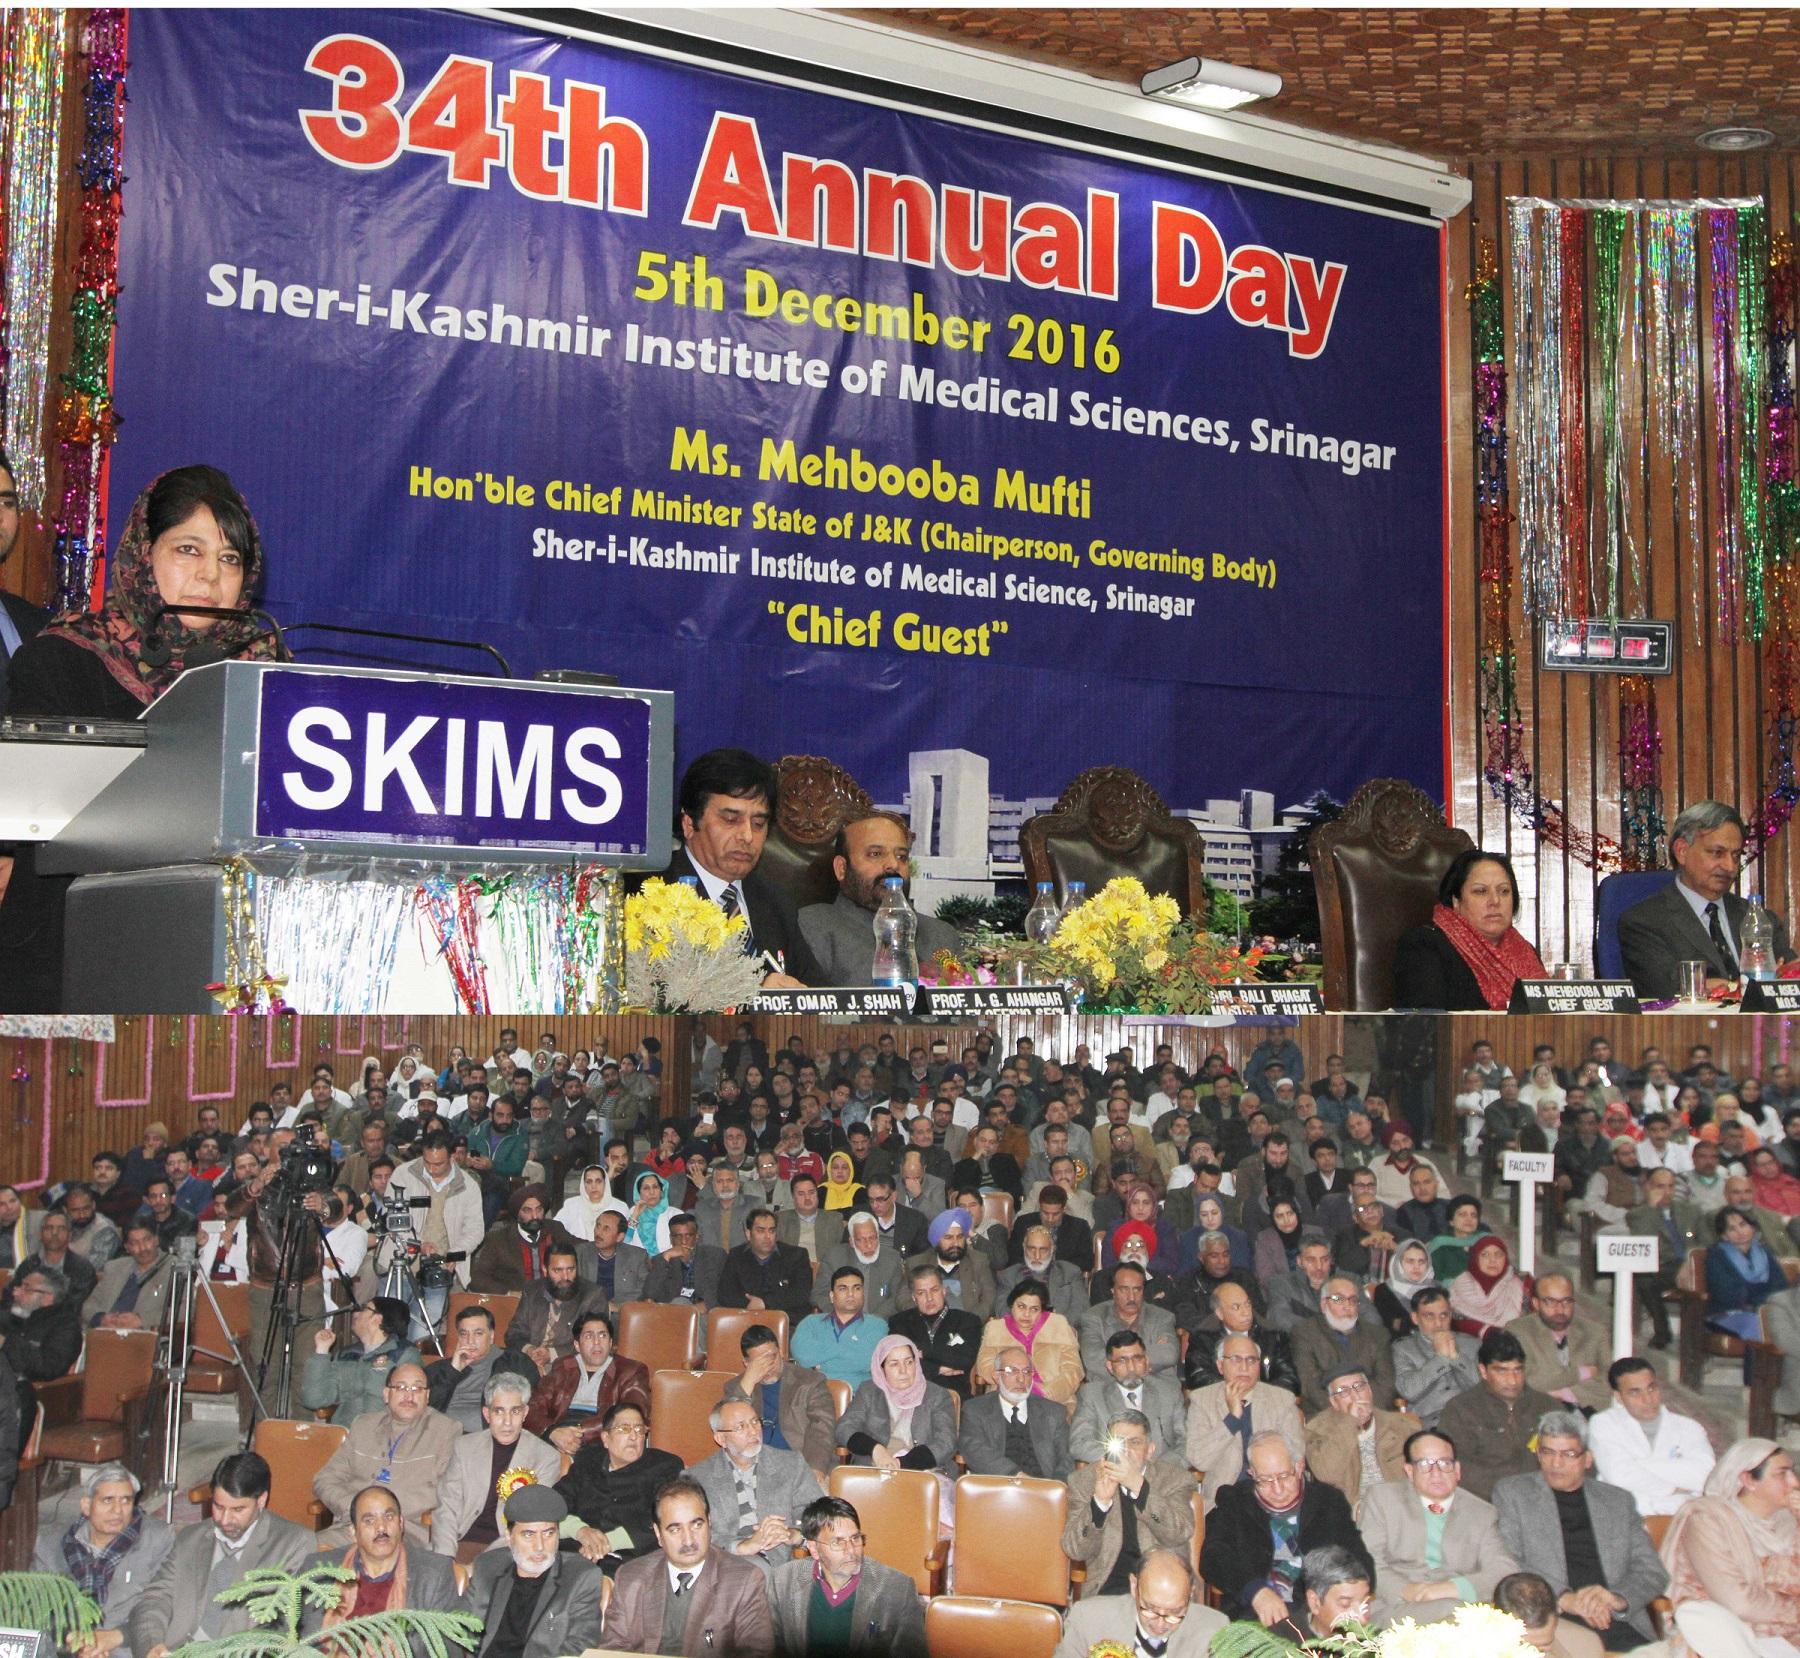 SKIMS celebrates its 34thAnnual Day